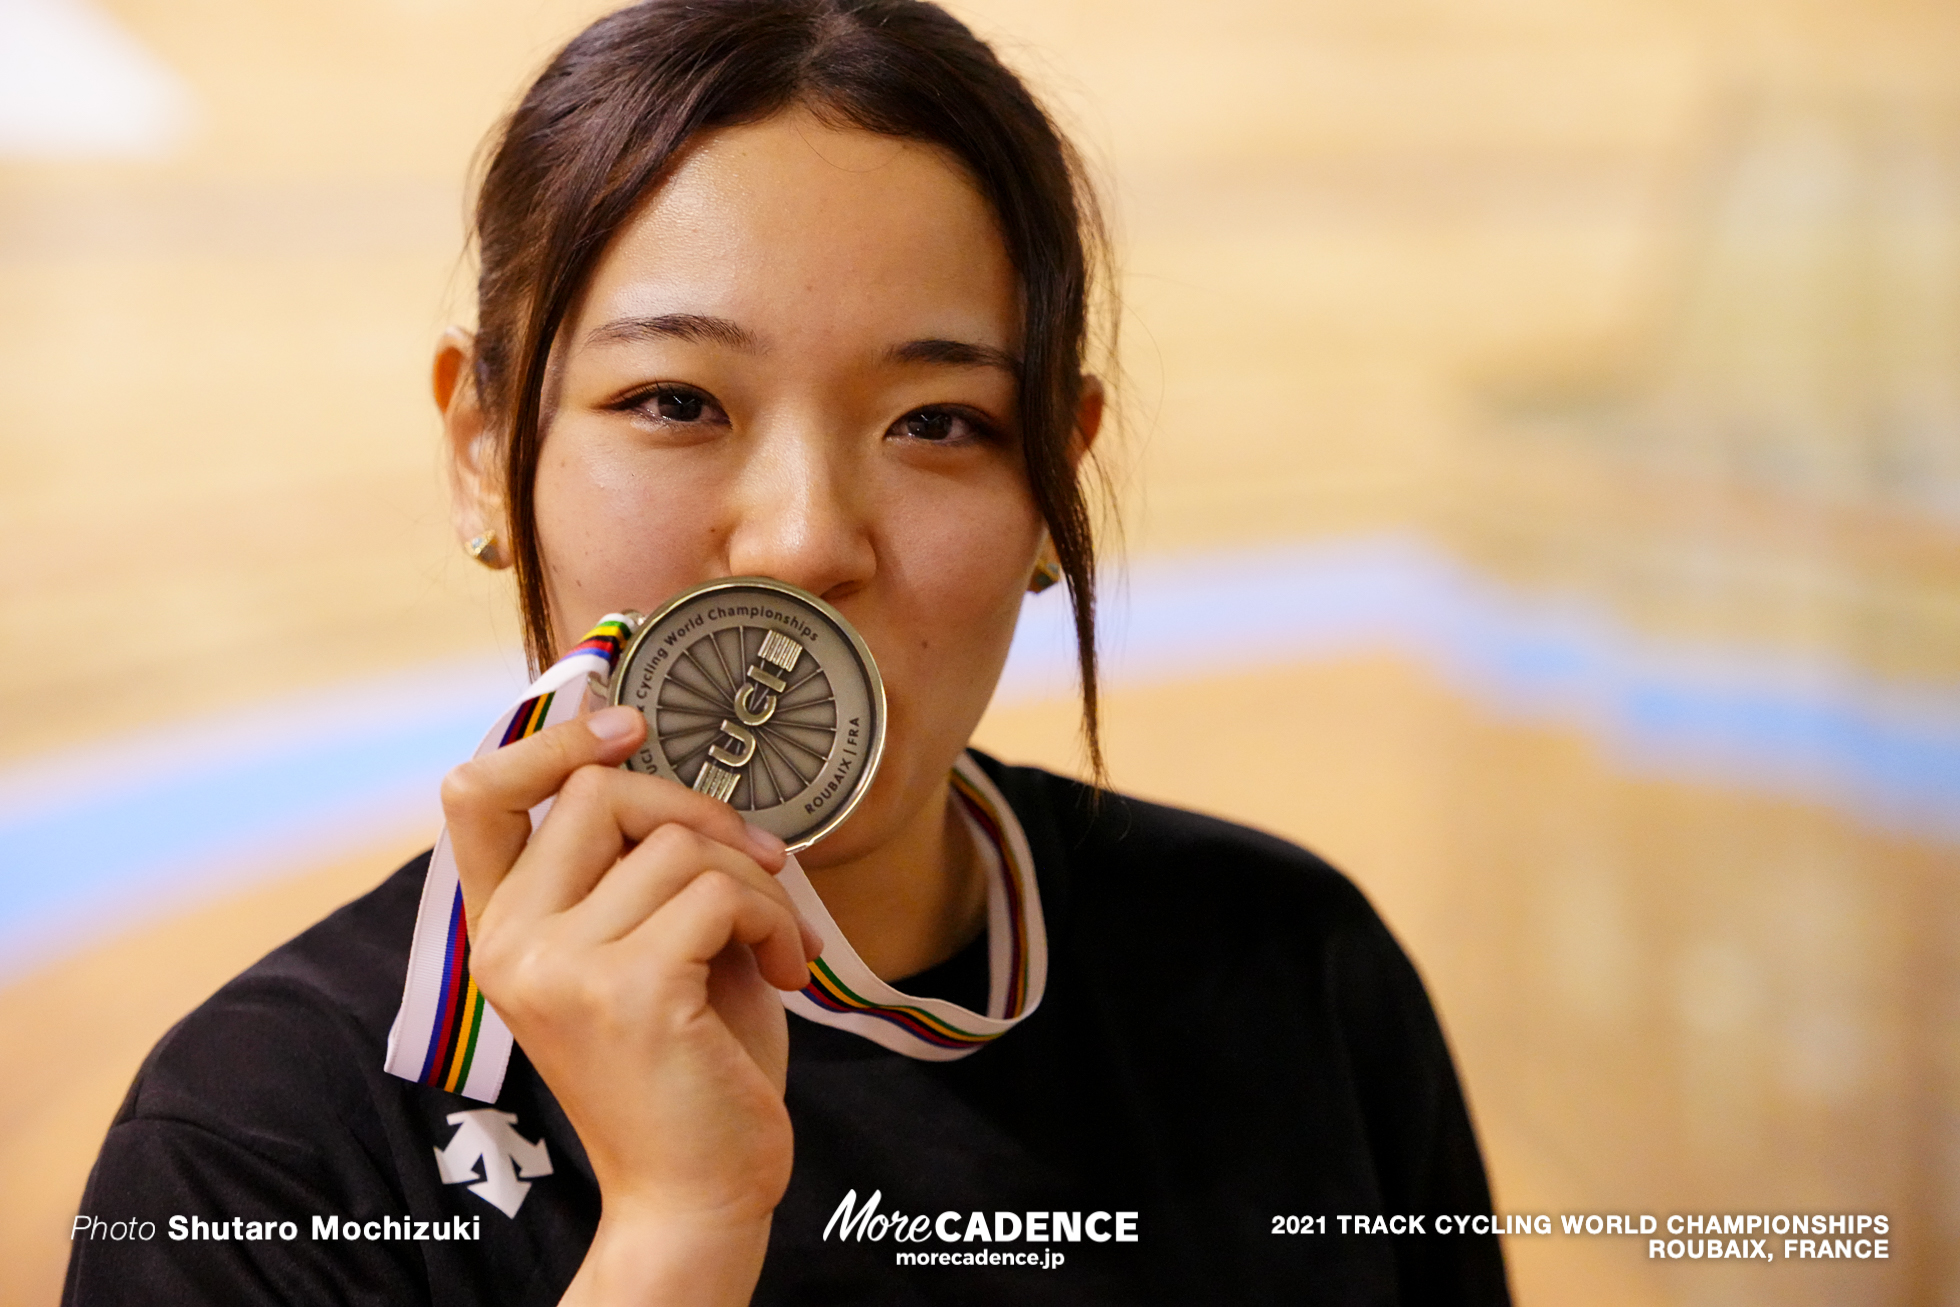 Women's Keirin / 2021 Track Cycling World Championships, Roubaix, SATO Mina(JPN)佐藤水菜, ジェイソン・ニブレット